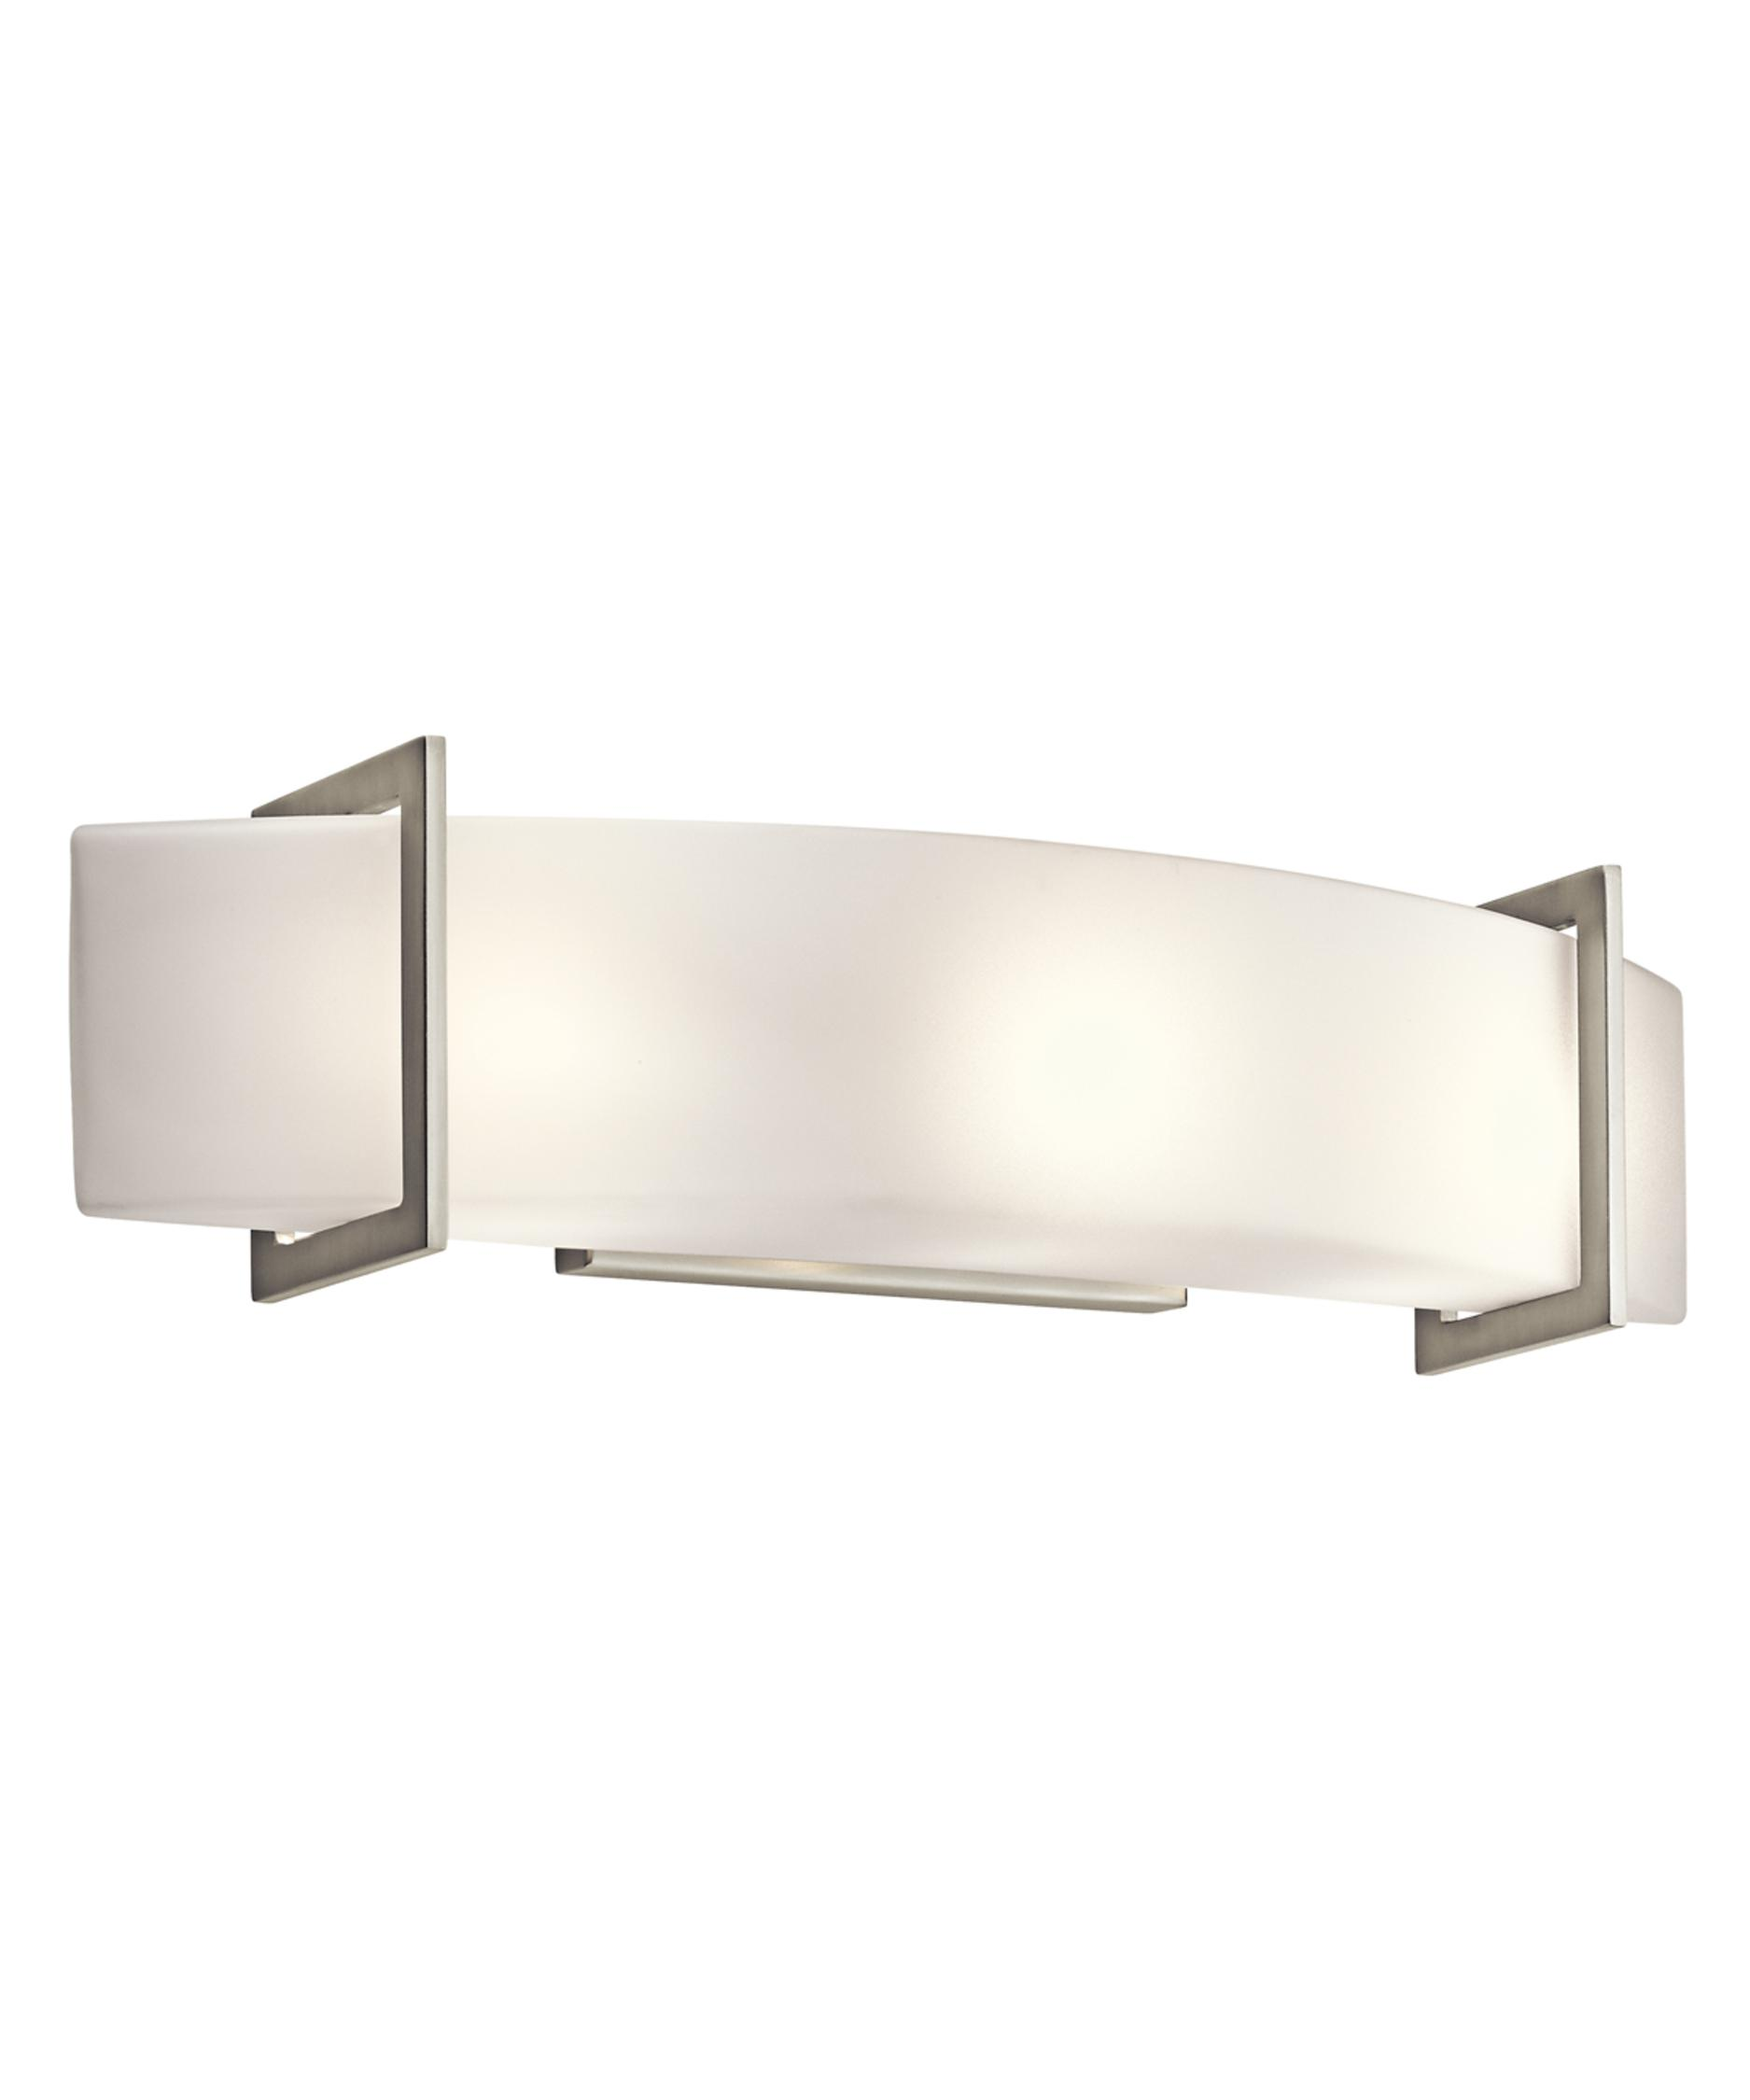 Bathroom Vanity Lights Kichler kichler 45220 crescent view 24 inch wide bath vanity light